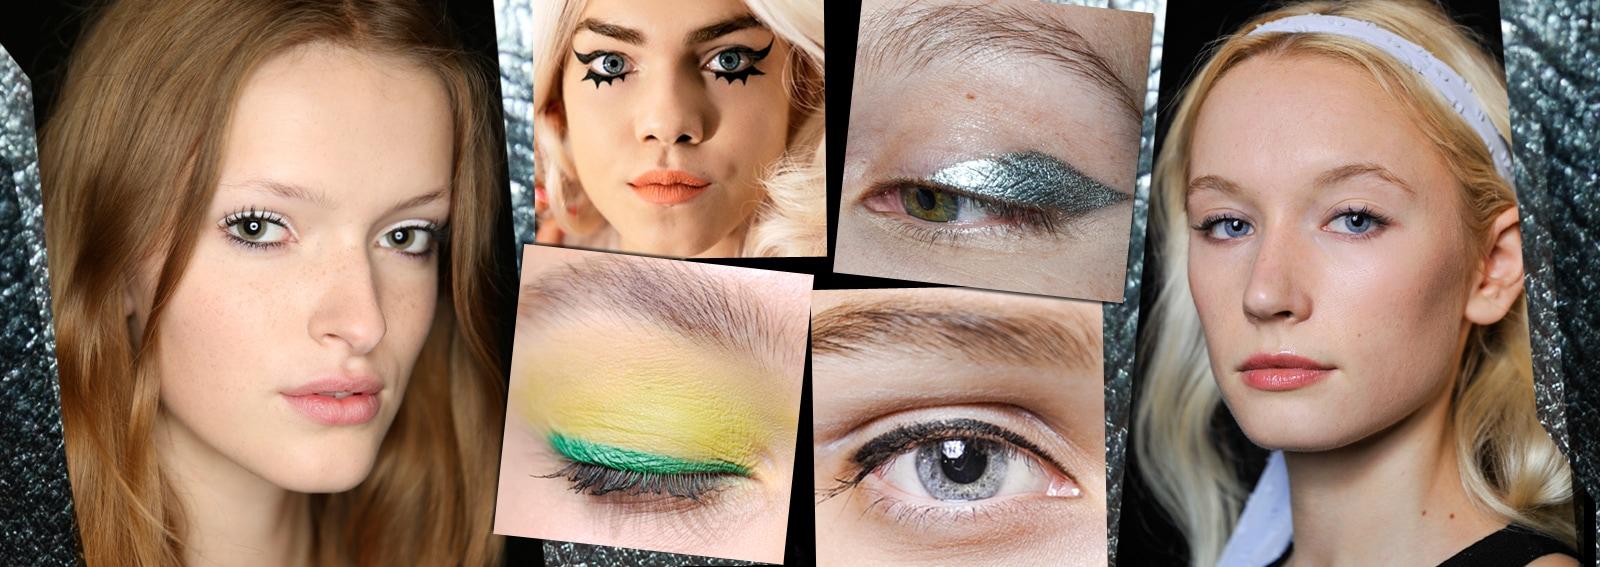 cover-trucco-occhi-con-eyeliner-tutte-DESKTOP